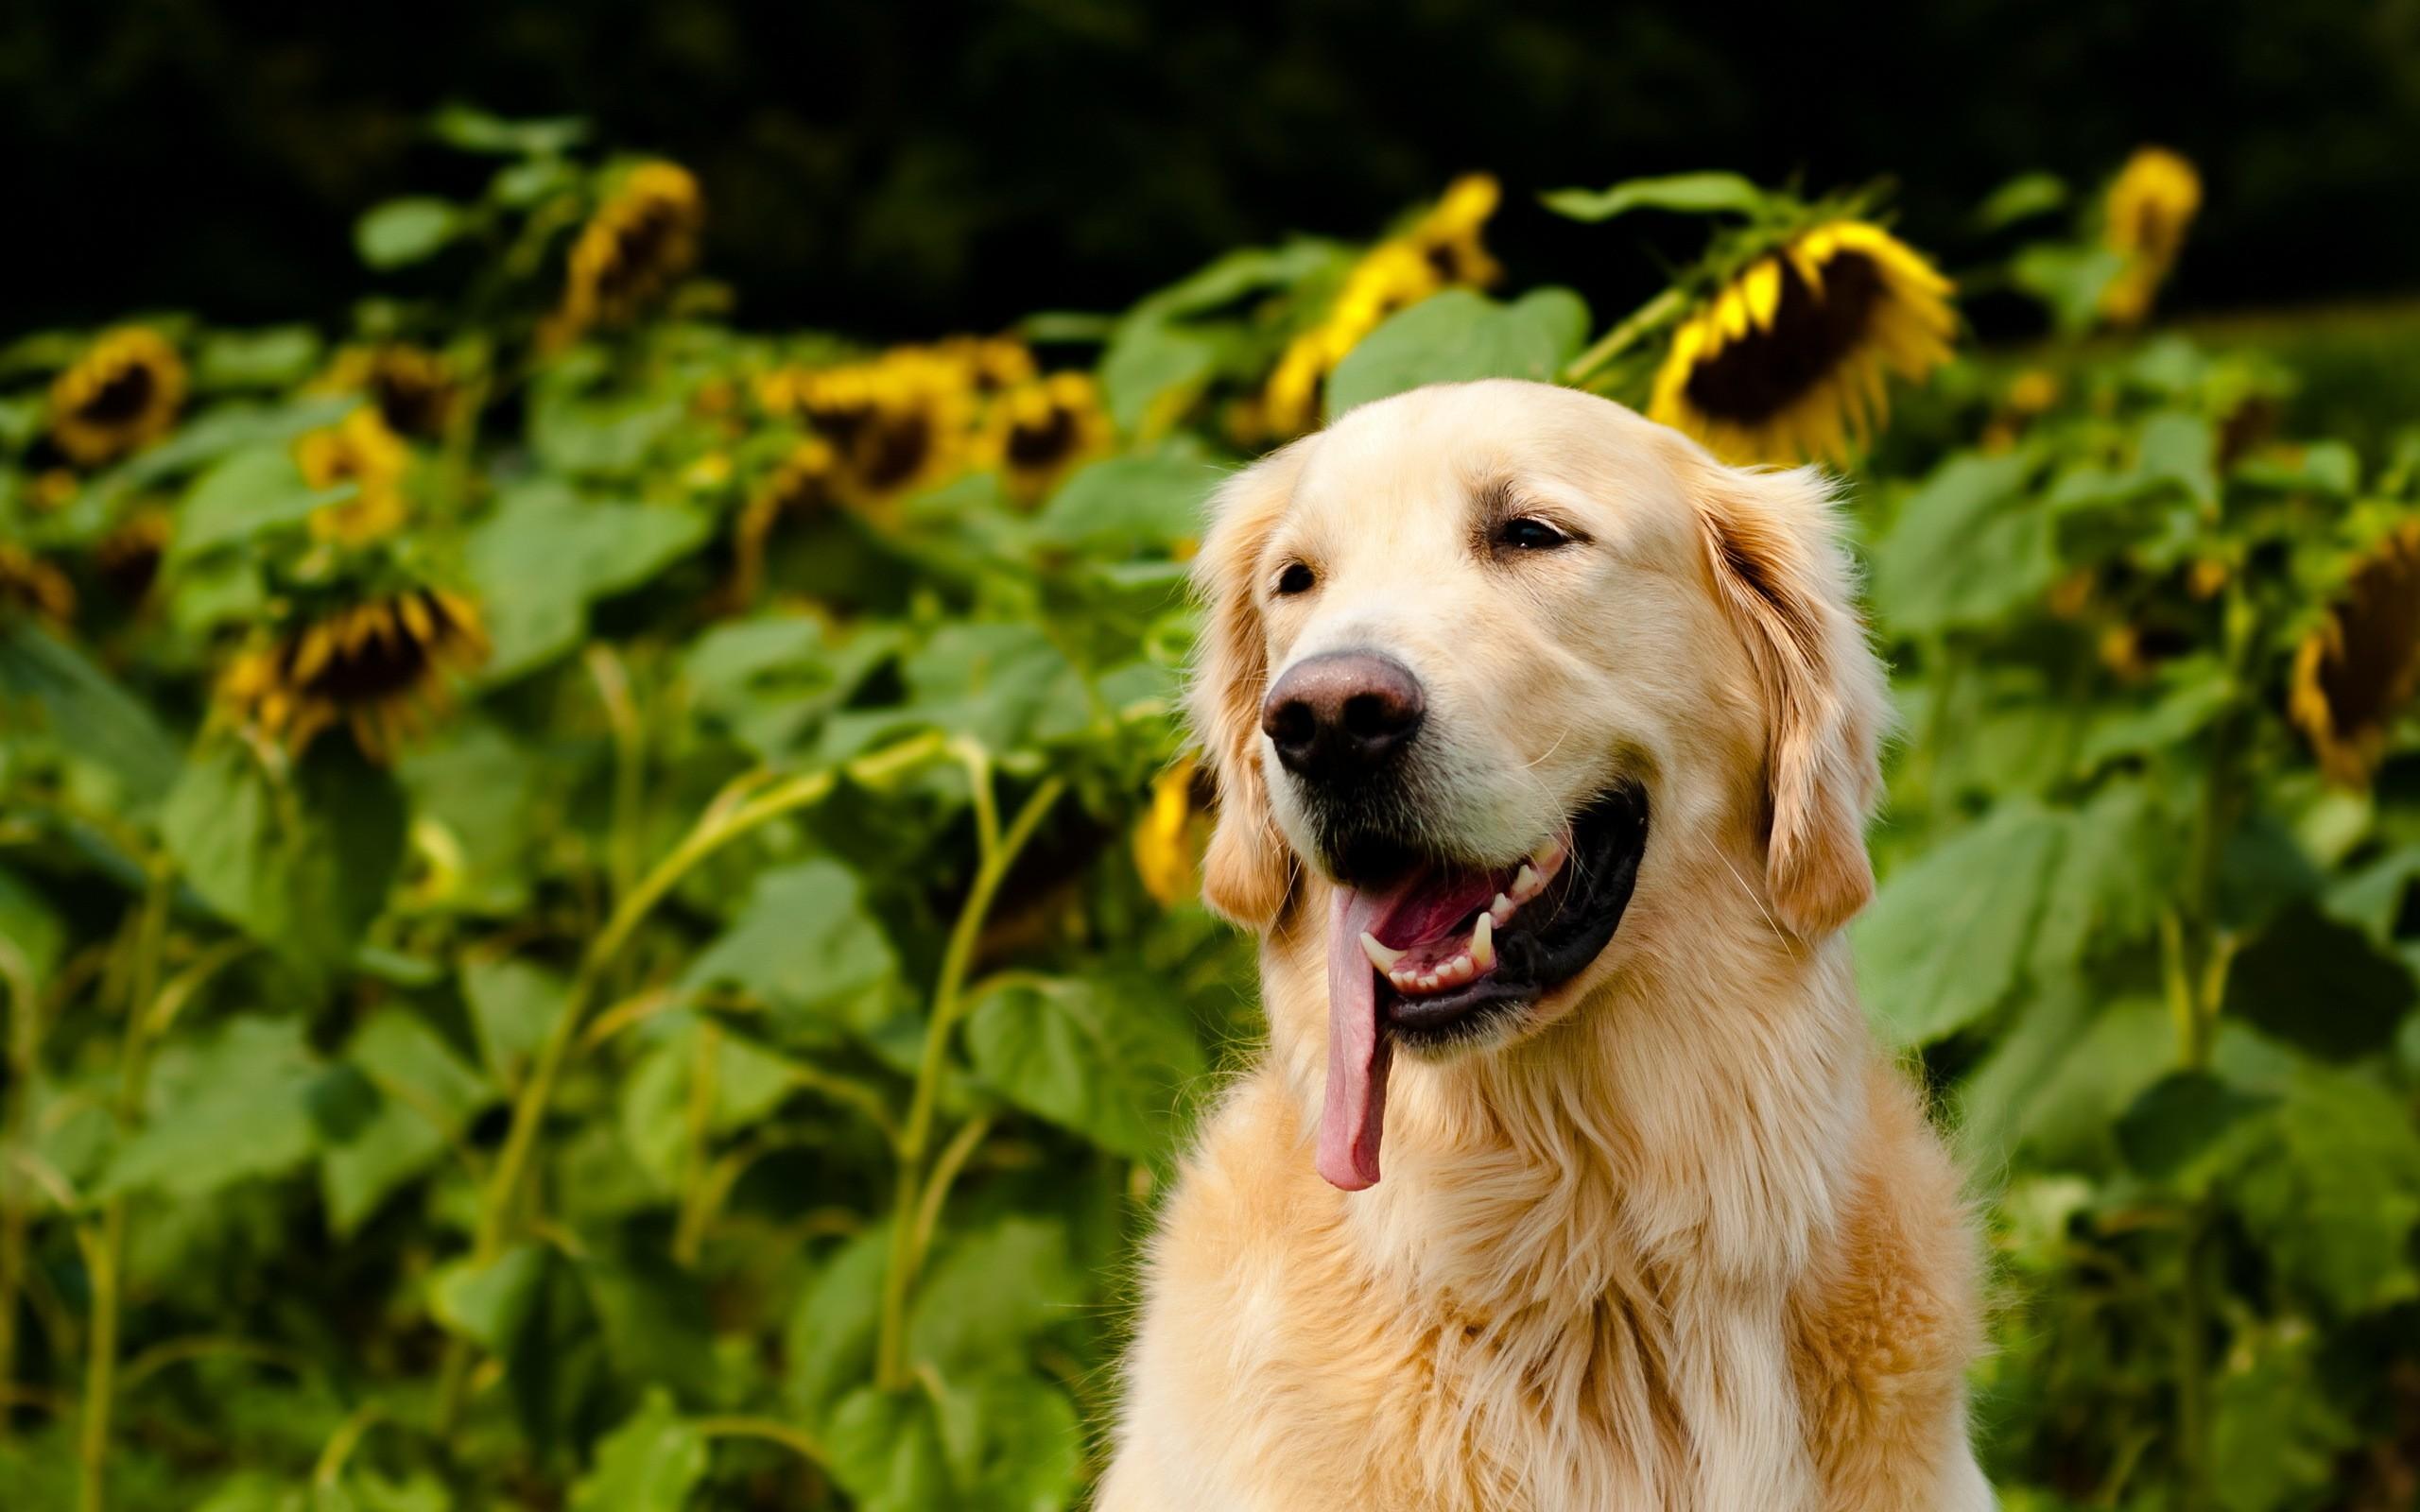 собака животное природа  № 690844 бесплатно